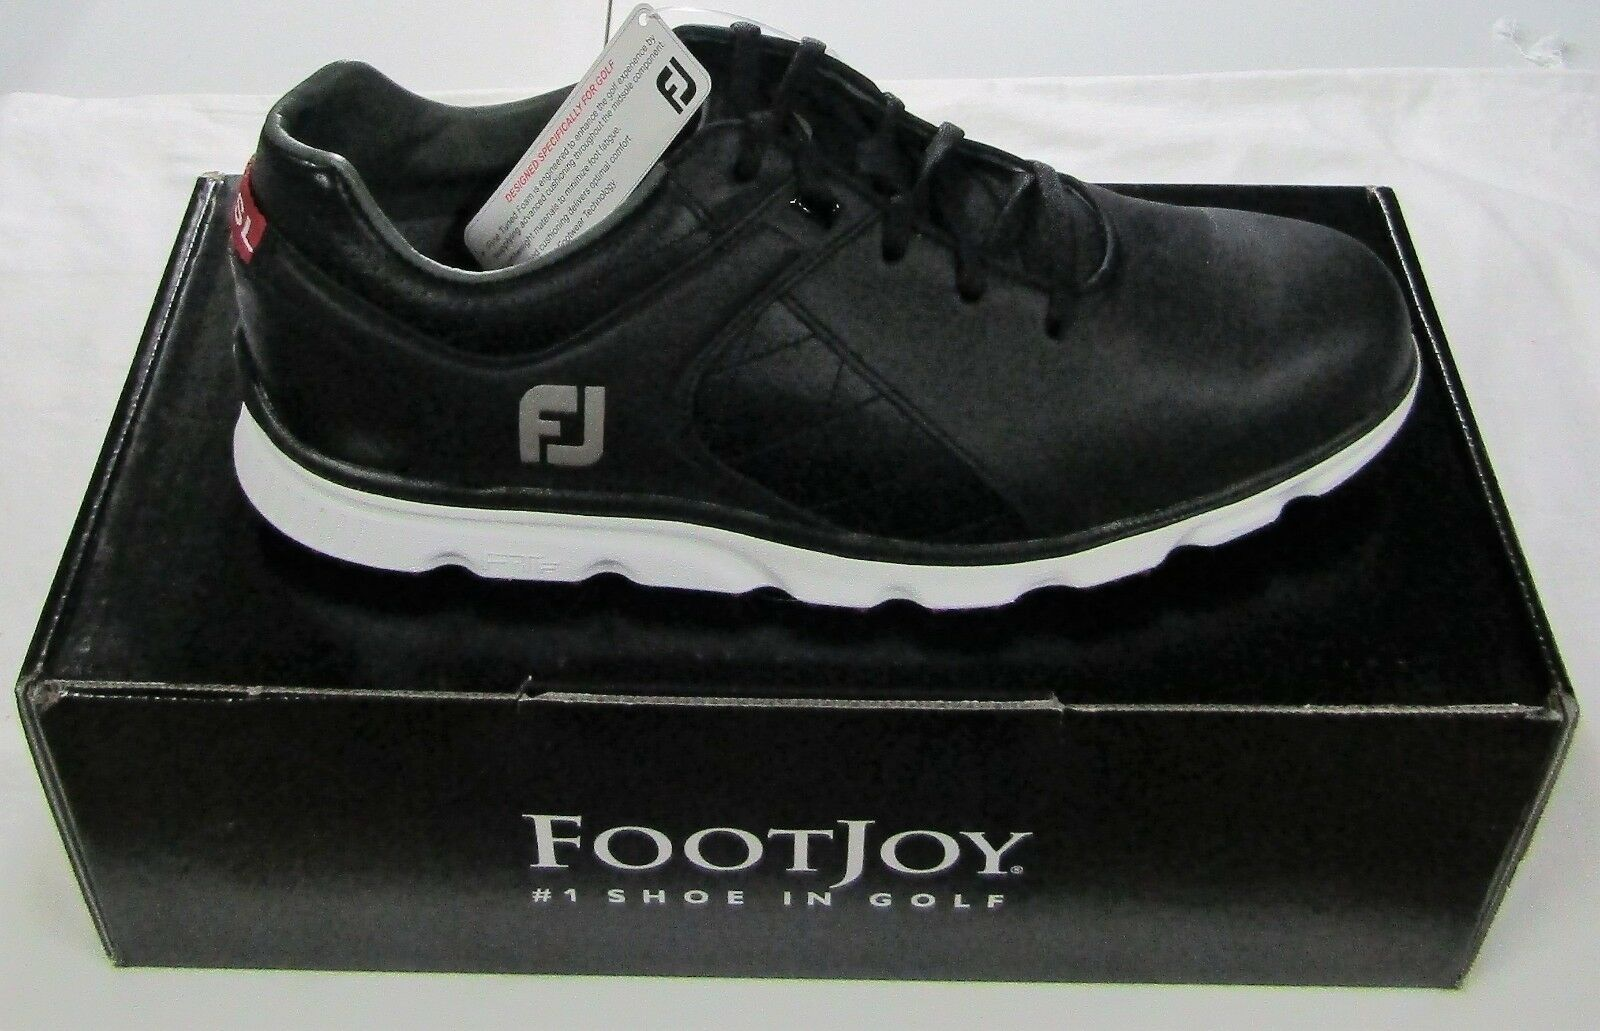 FootJoy Pro SL Spikeless Golf Shoes Color Black Style 53594 Choose ... f95da9ca138